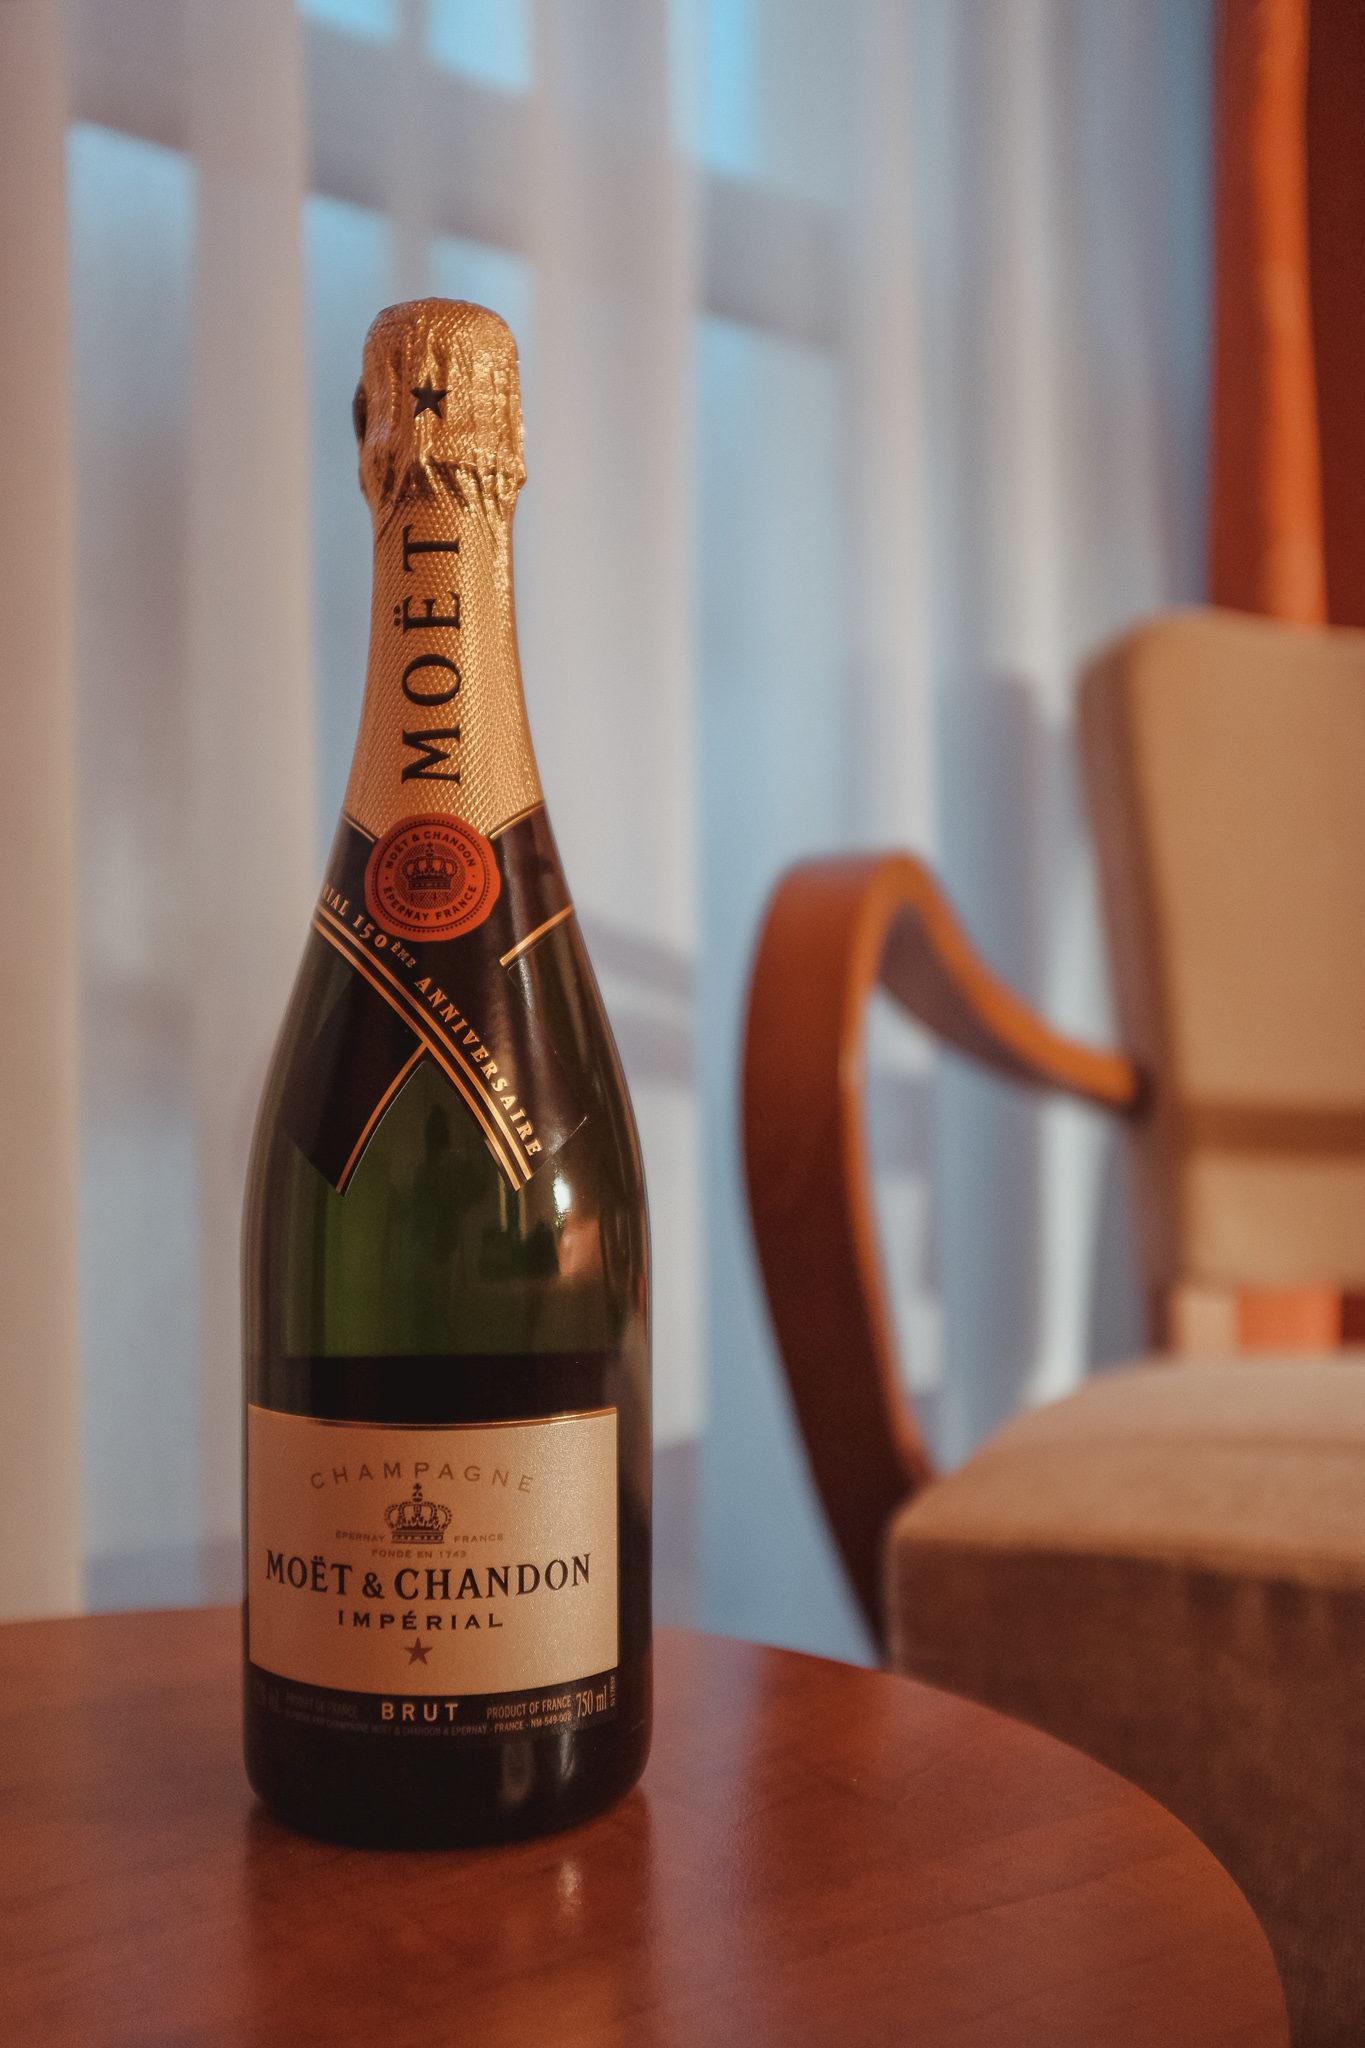 Bouteille de Champagne Moet & Chandon Épernay